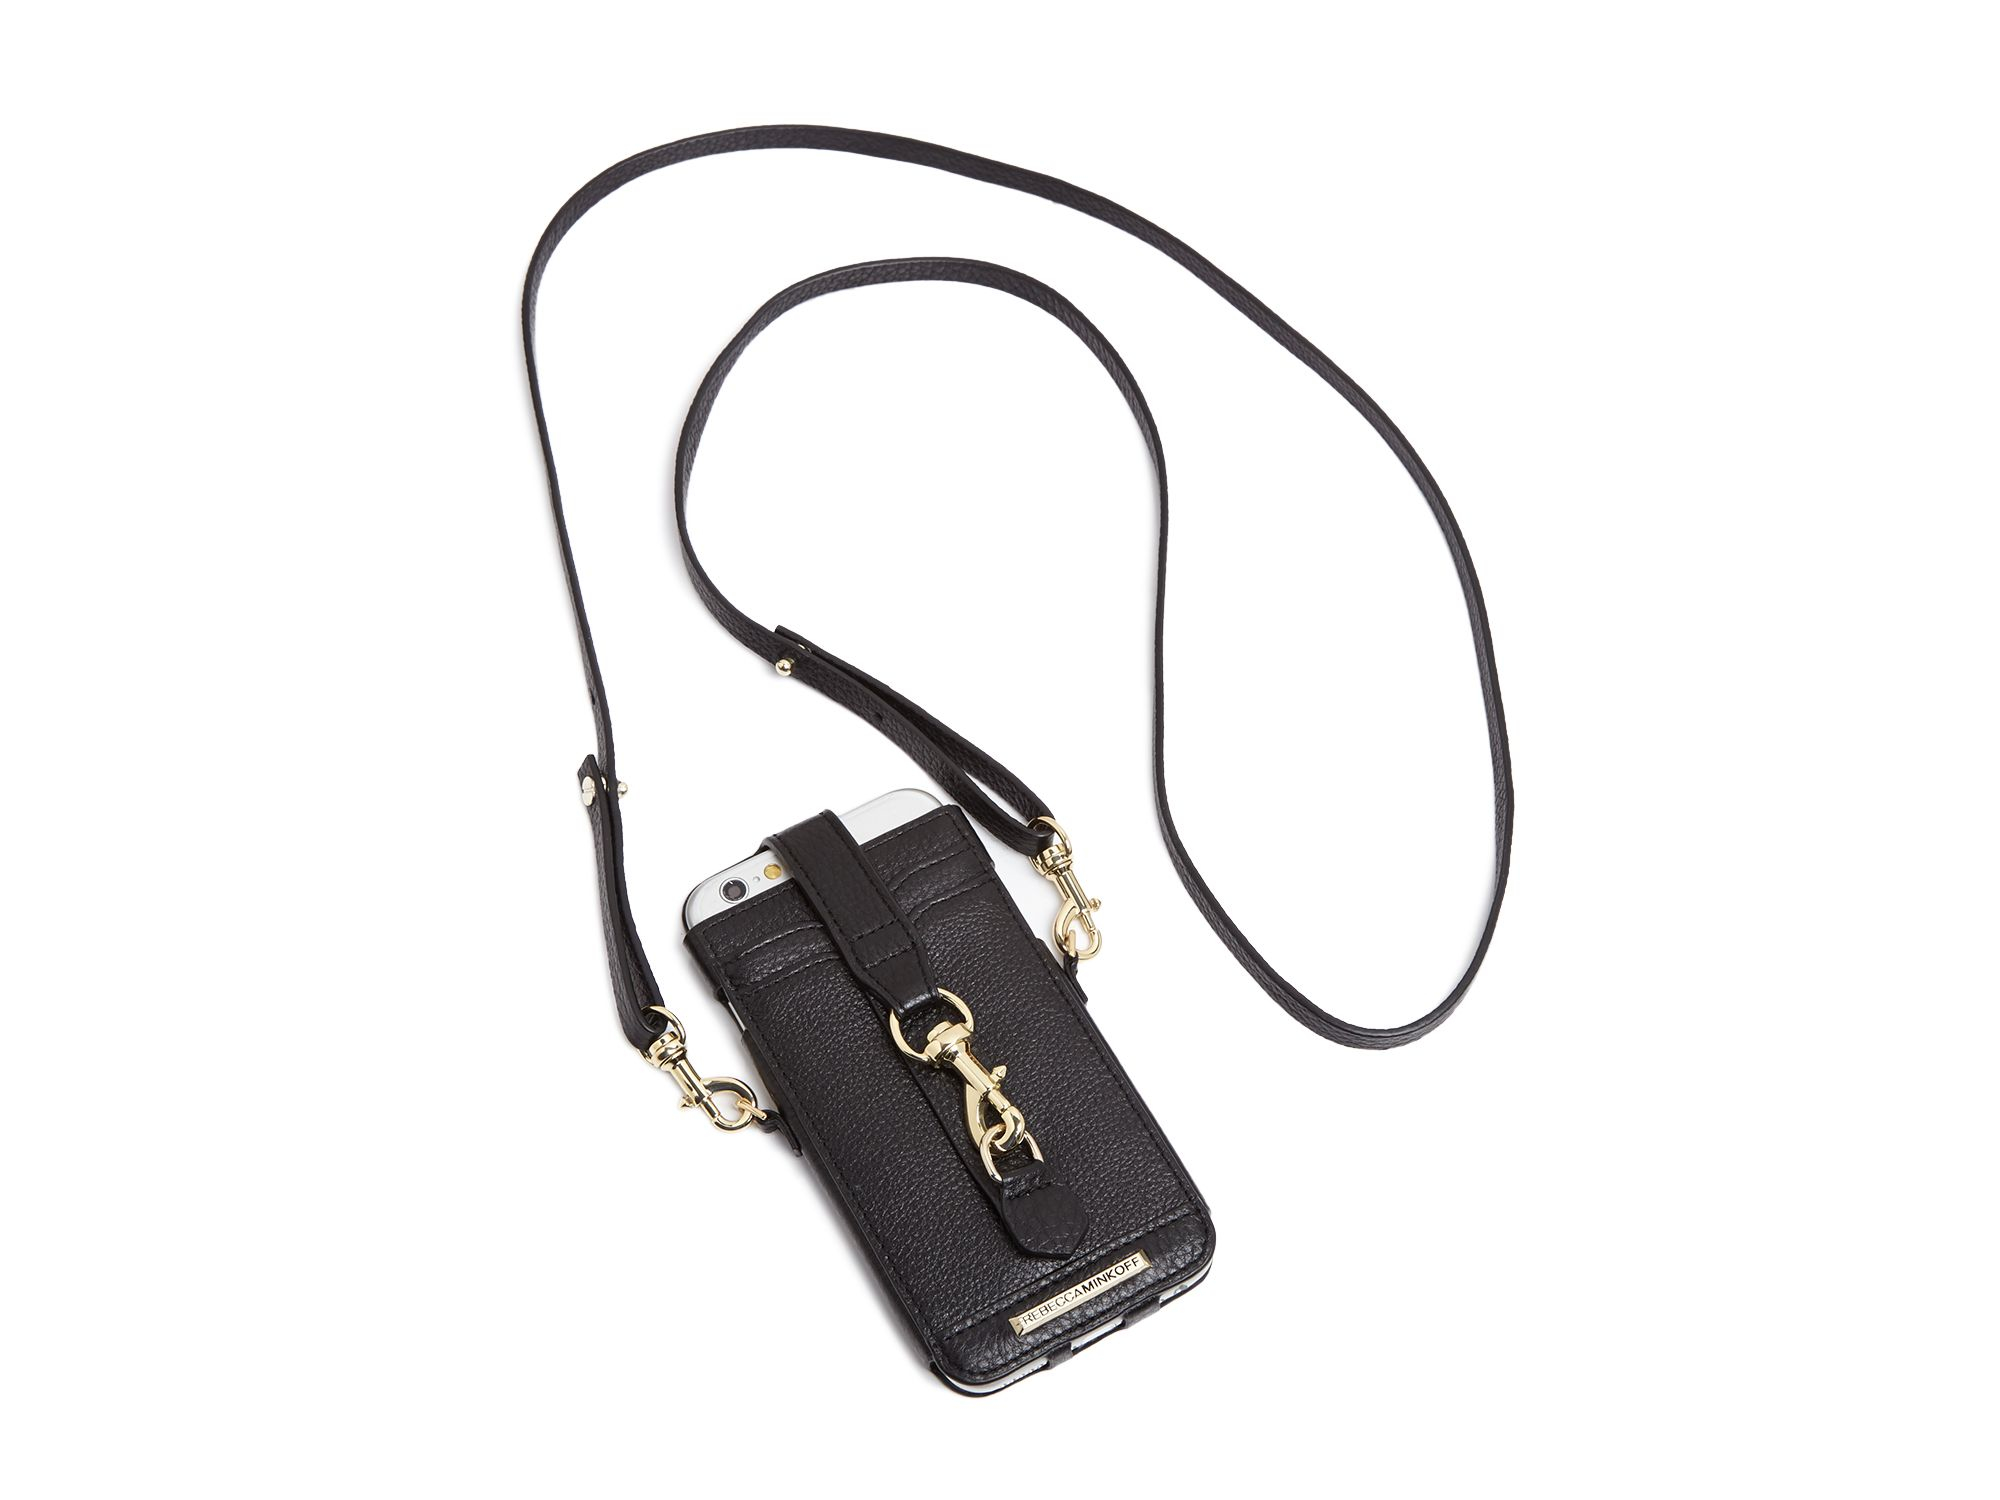 buy popular 56f28 8f71f Rebecca Minkoff Black Dogclip Crossbody Iphone 6 Case